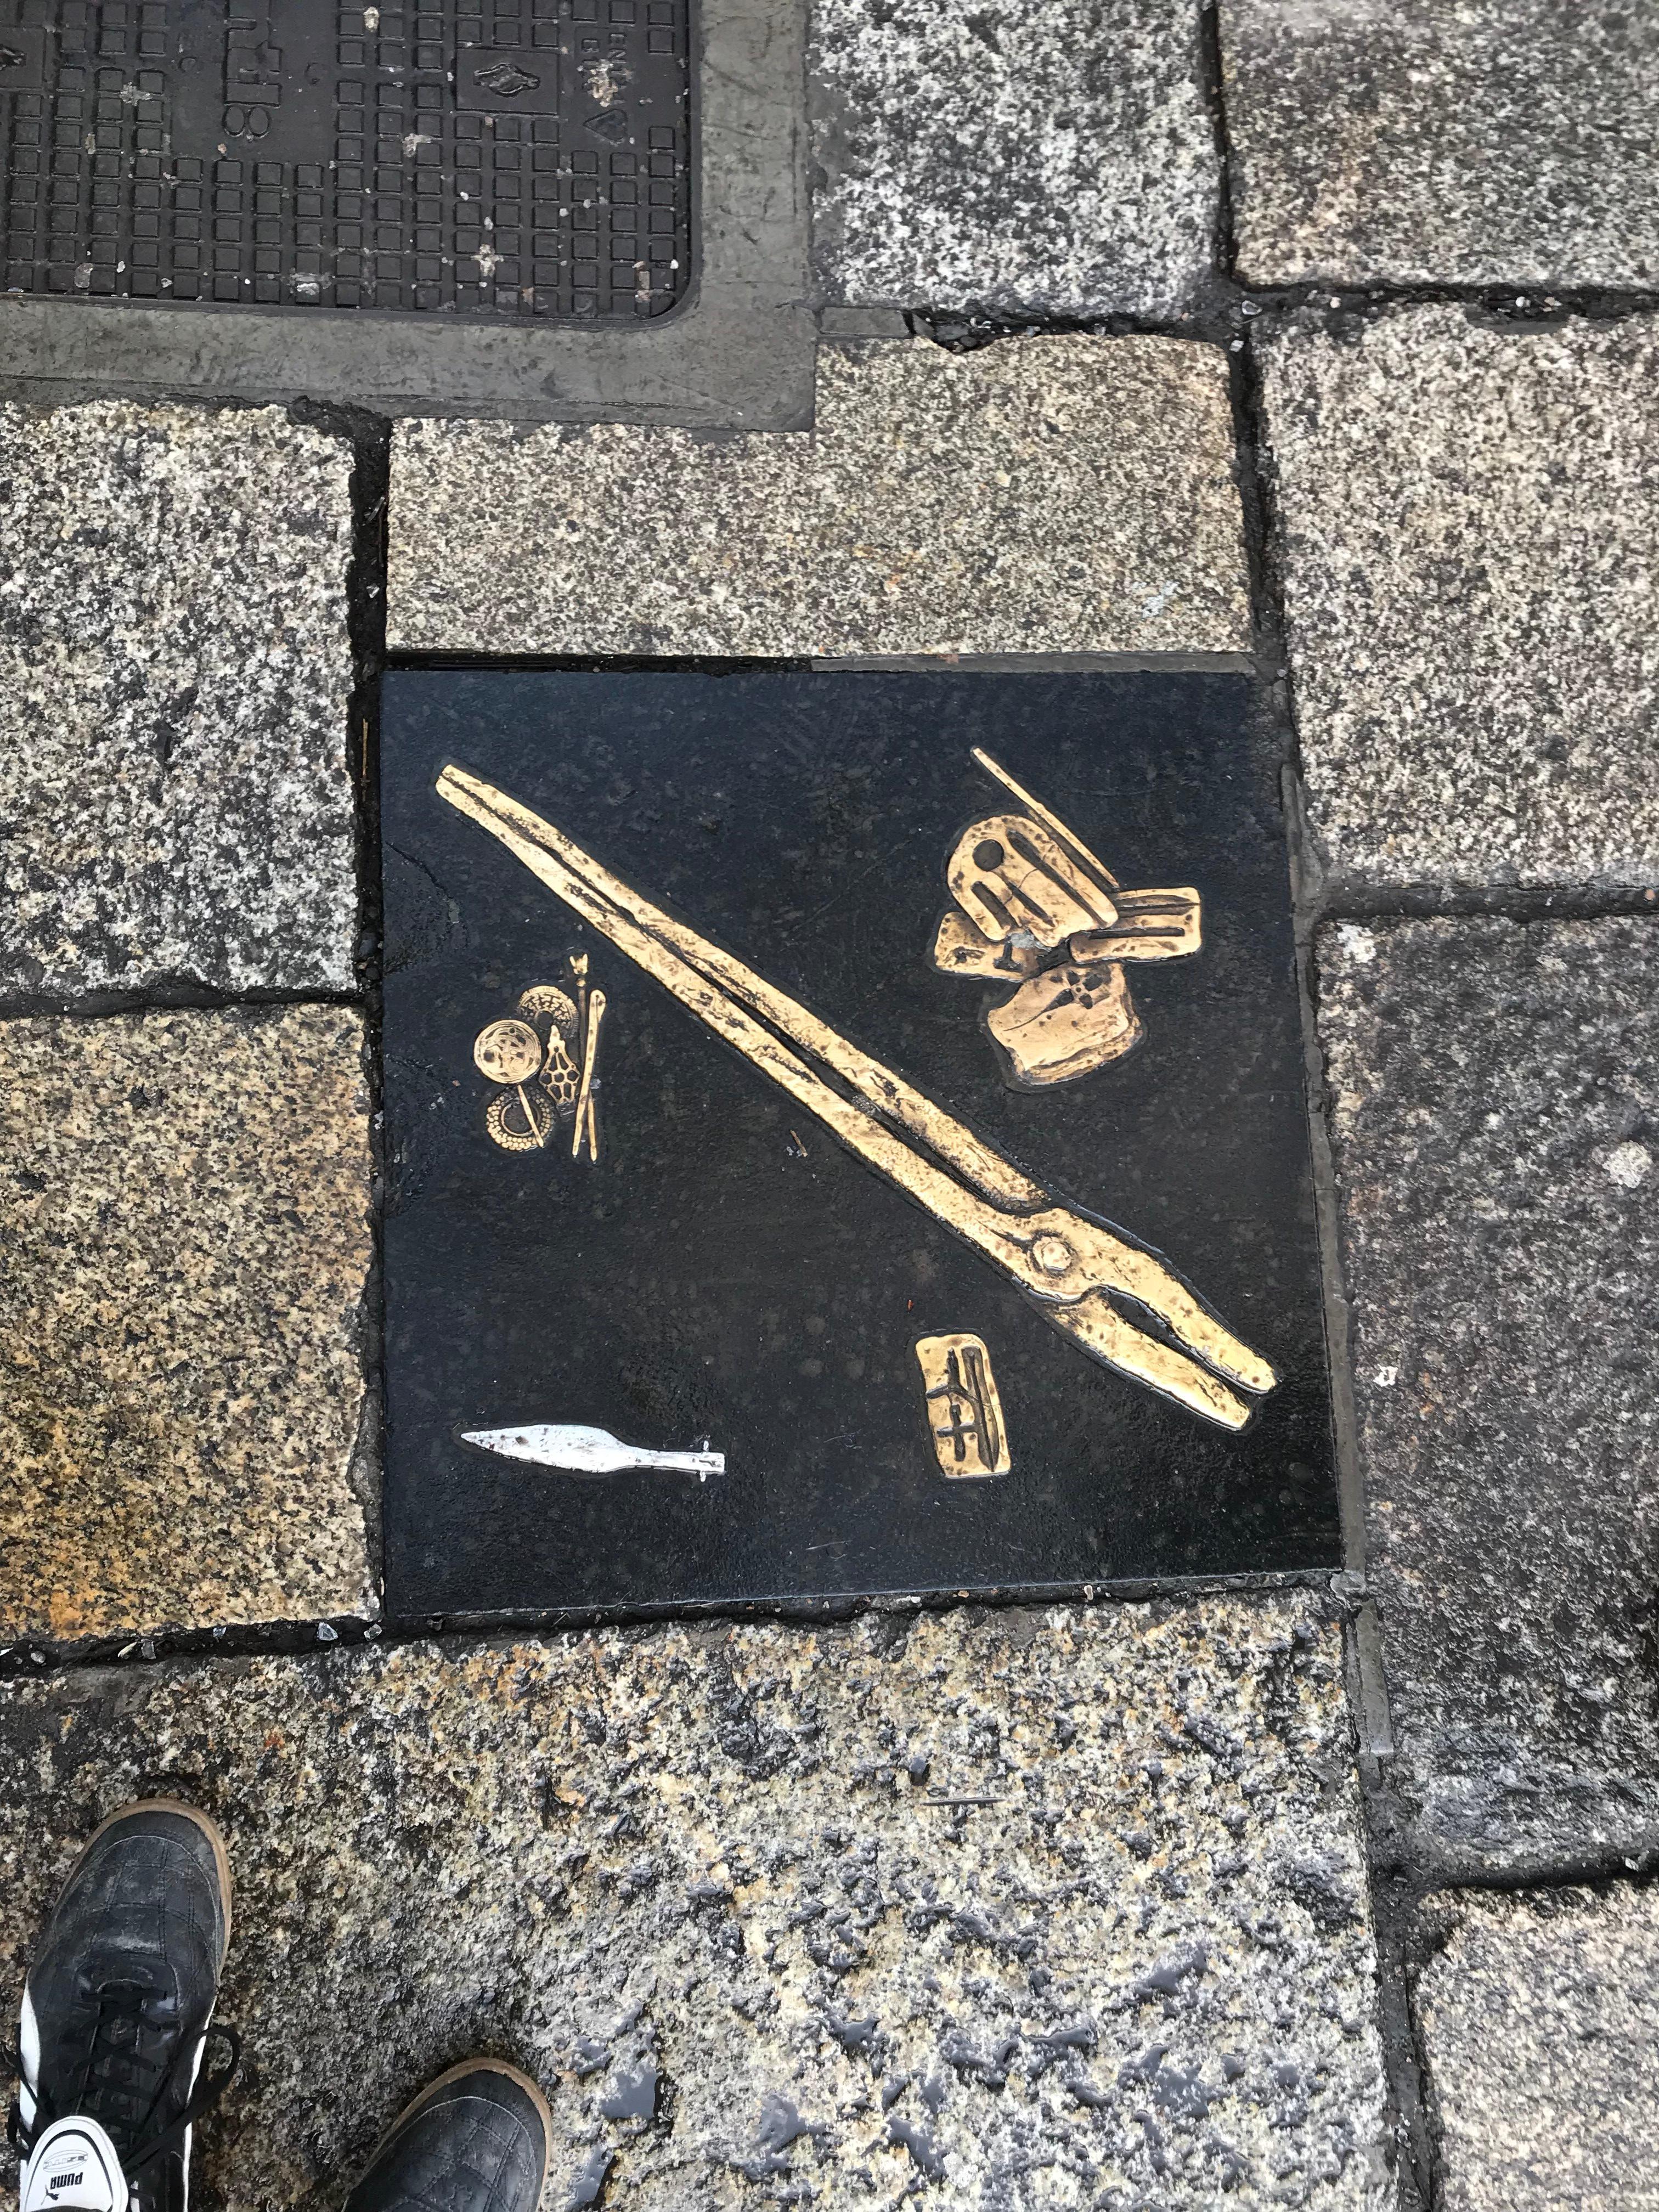 CAPAStudyAbroad_Dublin_Spring2018_From Brandon Mooney - Imprinted Tile with Viking Artifacts on Sidewalk.jpeg